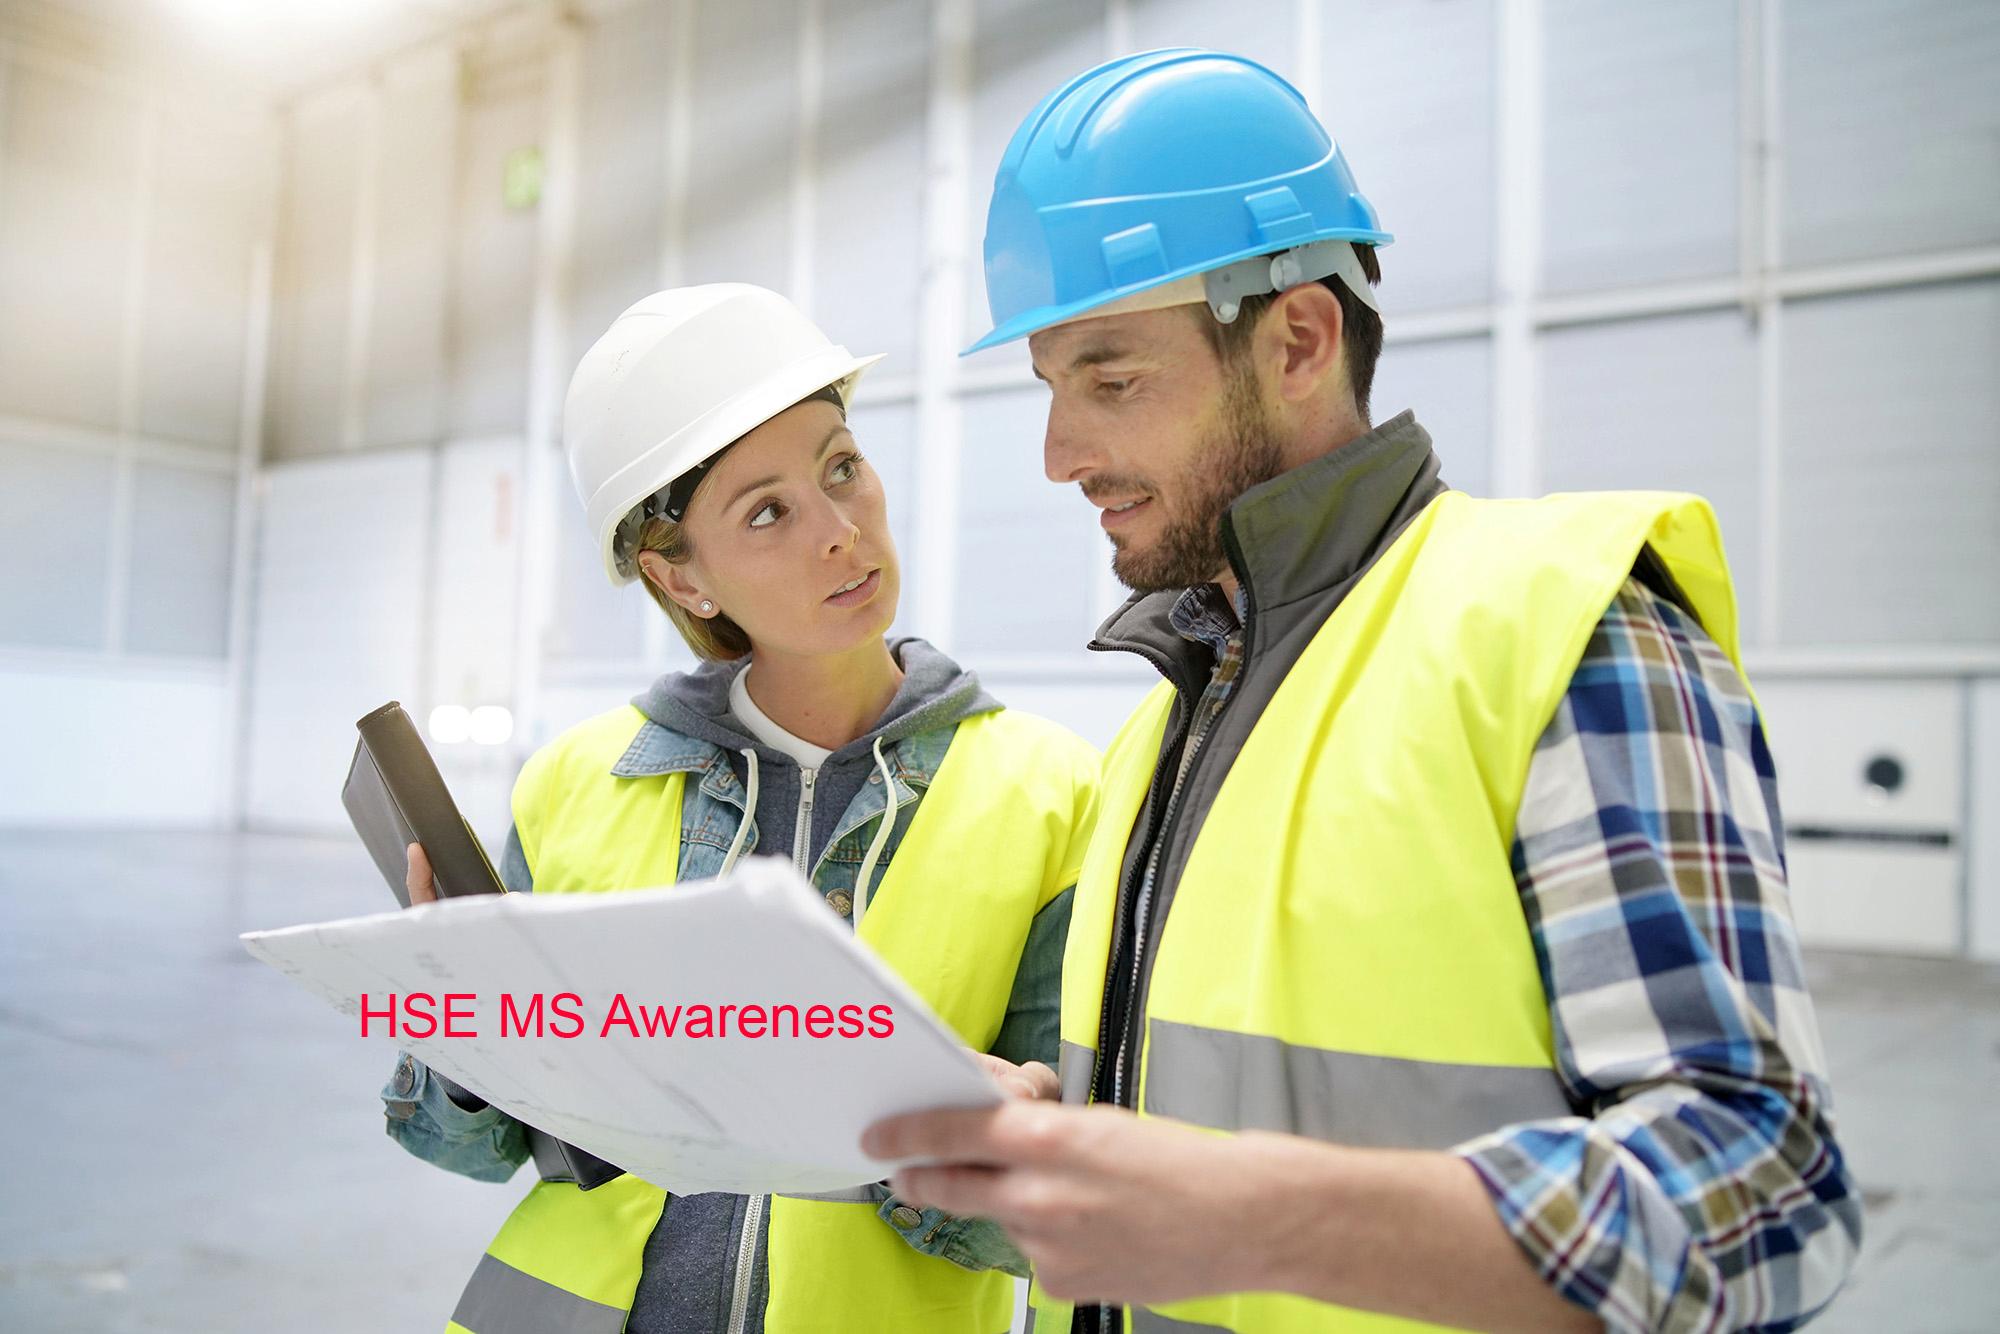 HSE MS Awareness